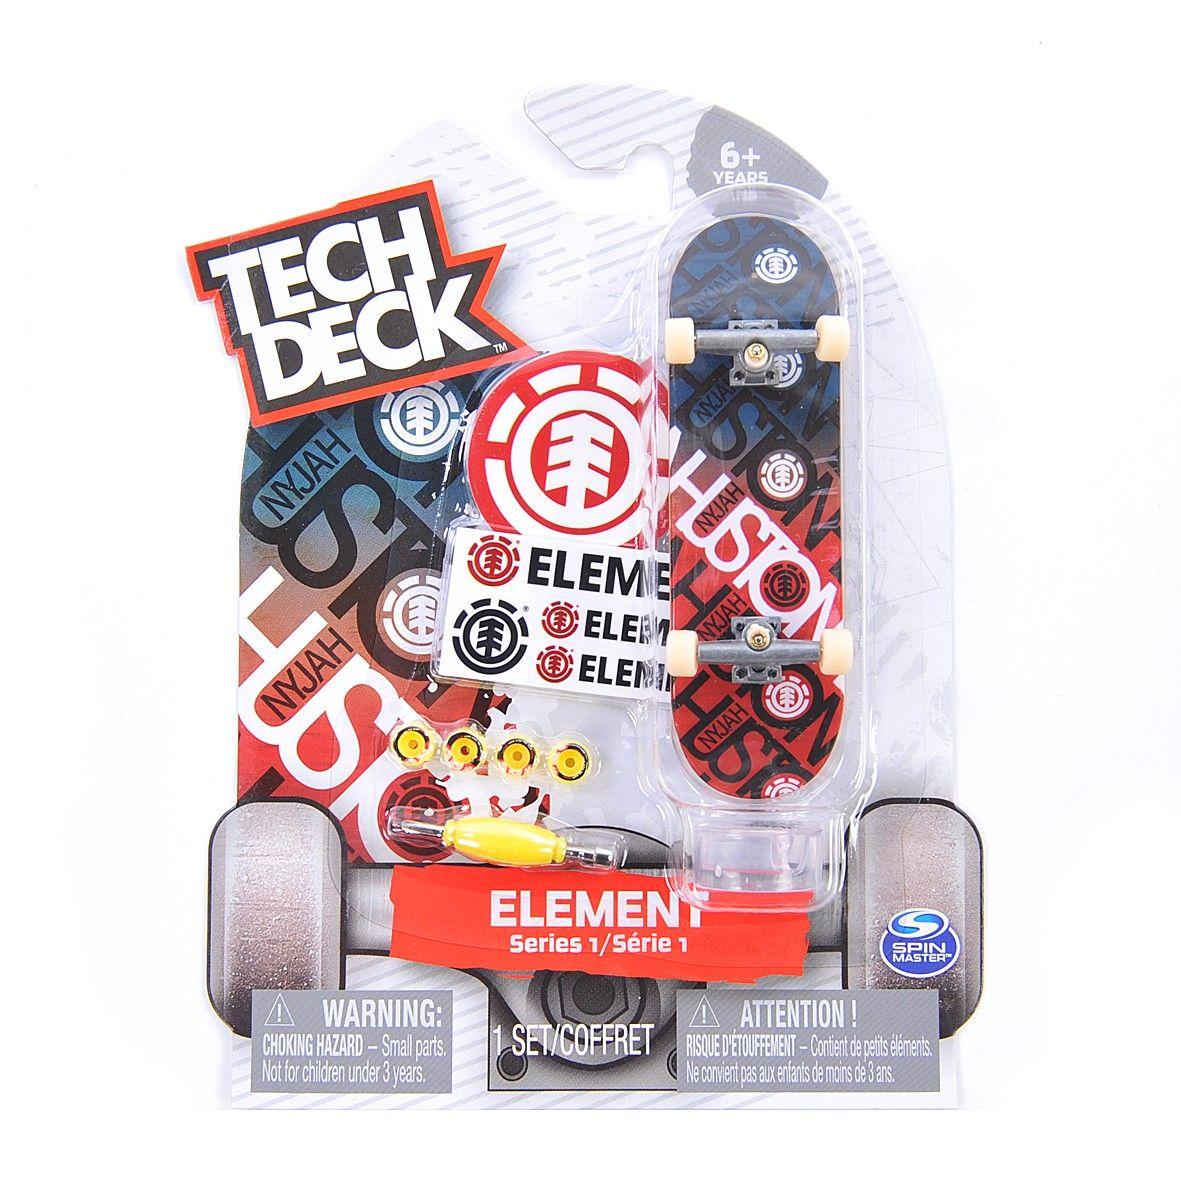 Tech Deck Element Series 1 Rare. Tech Deck brings you the